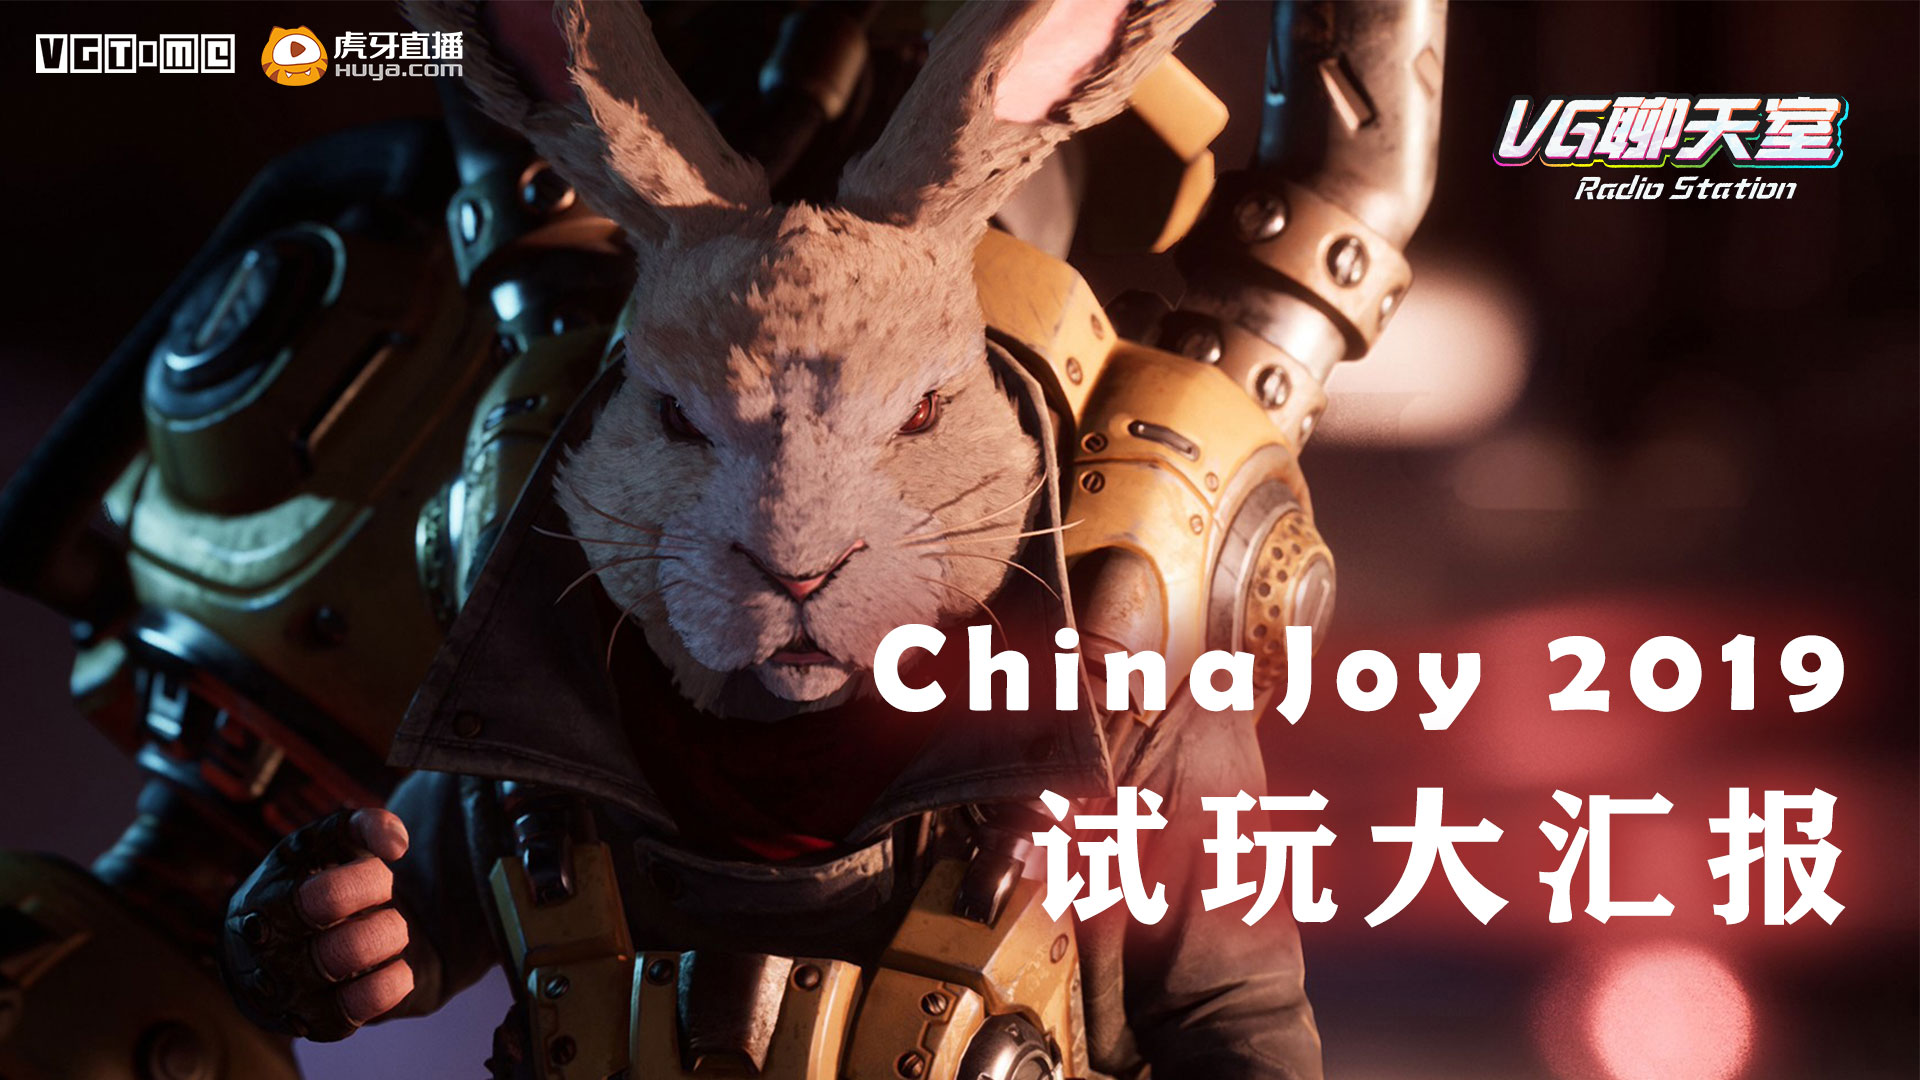 ChinaJoy 2019 试玩大汇报【VG聊天室248】